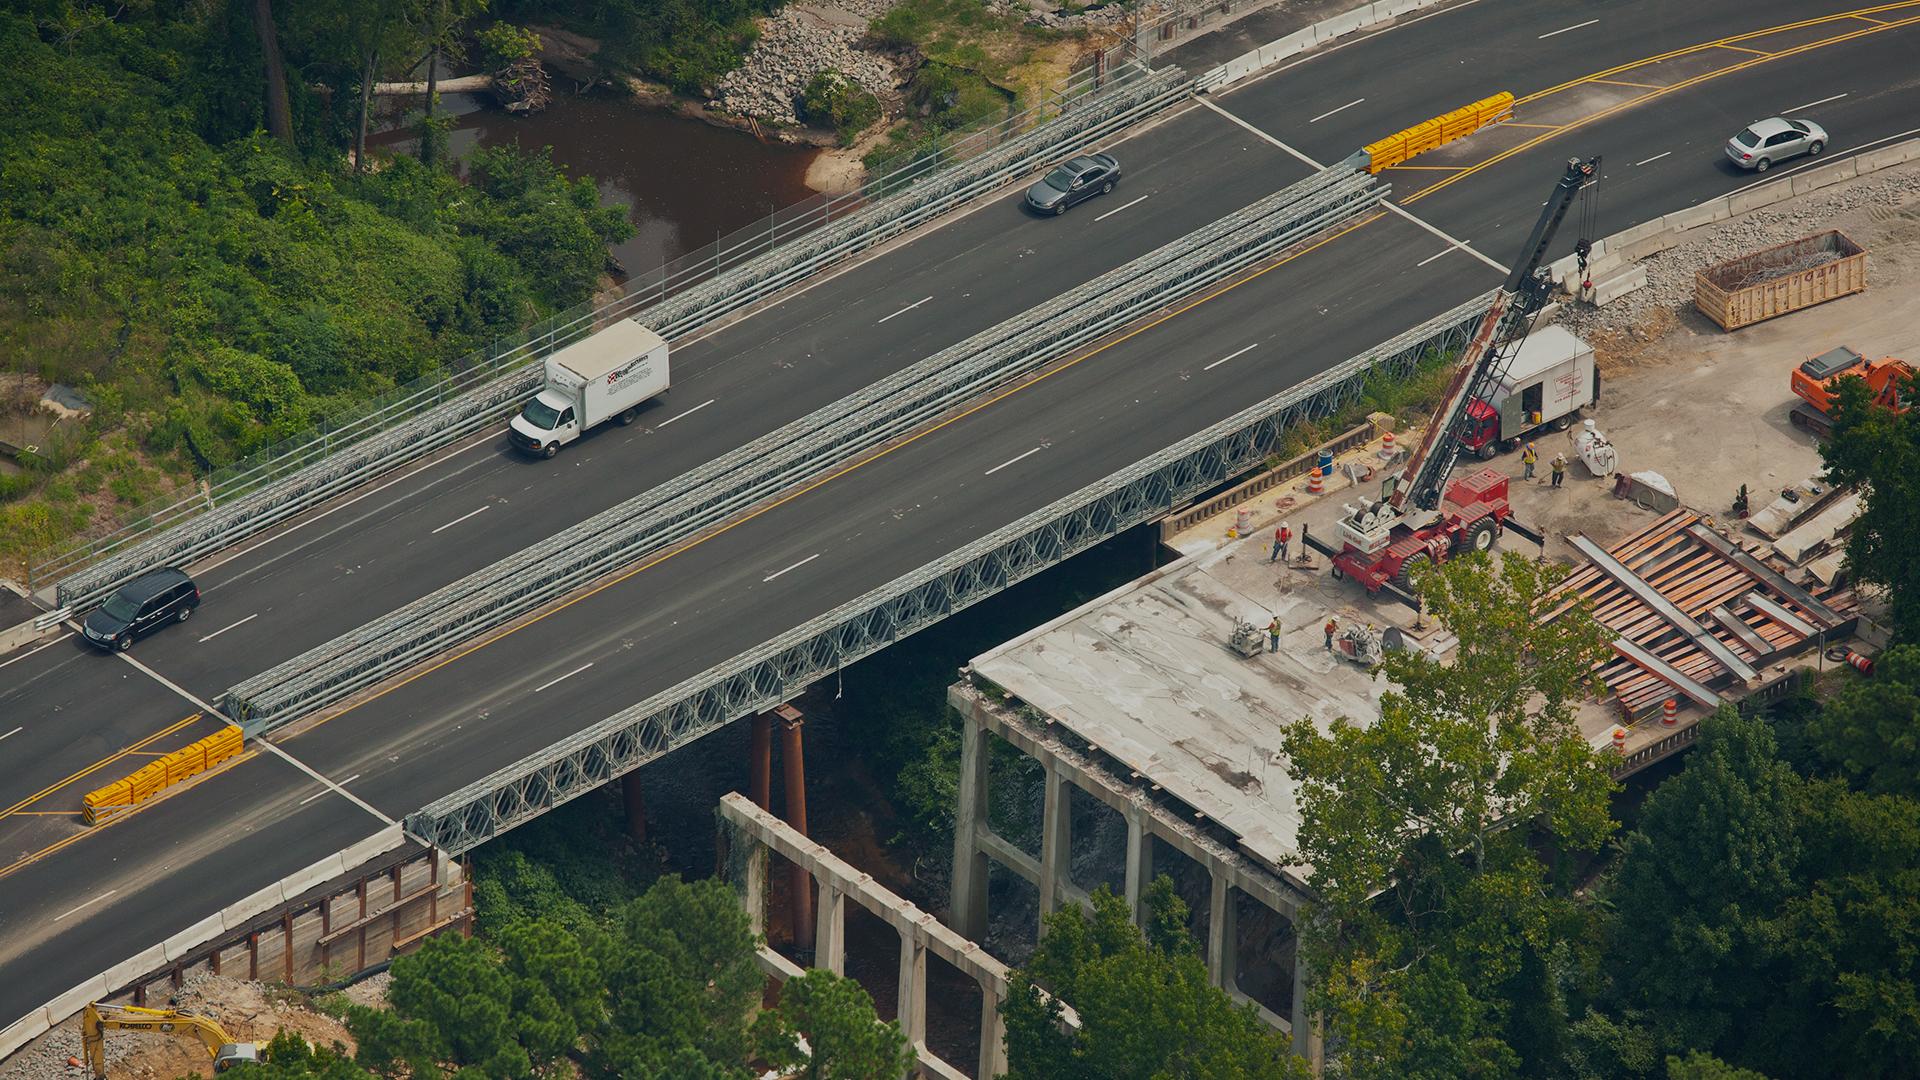 Temporary Rental Modular Bridges